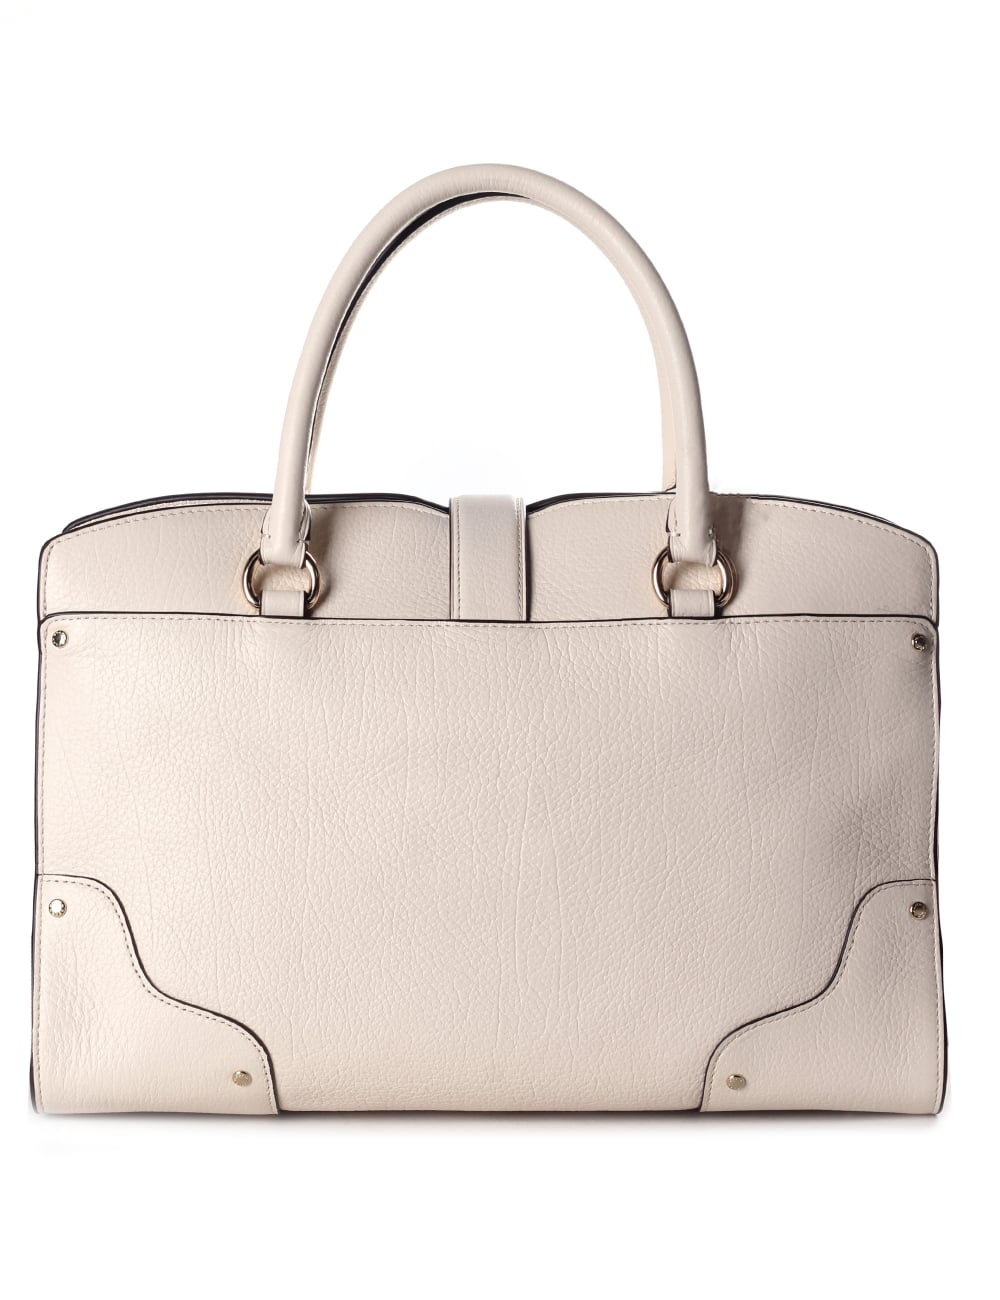 Coach Mercer Satchel 30 Grain Leather Bag be34fe40f84cb